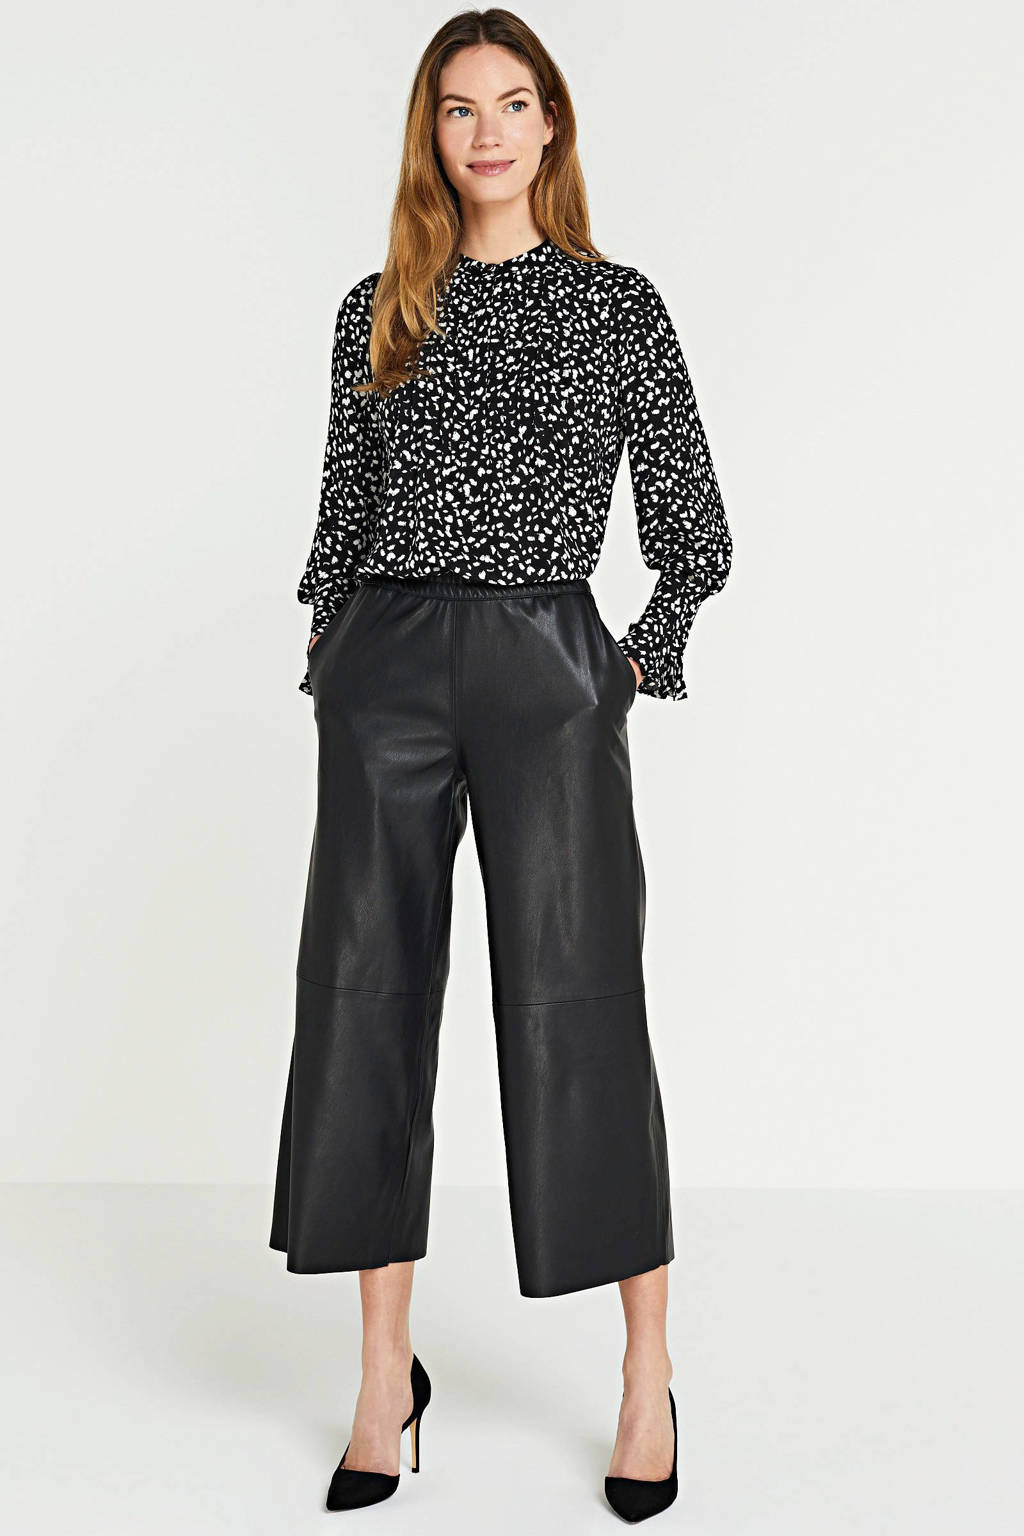 SELECTED FEMME blouse met all over print zwart, Zwart